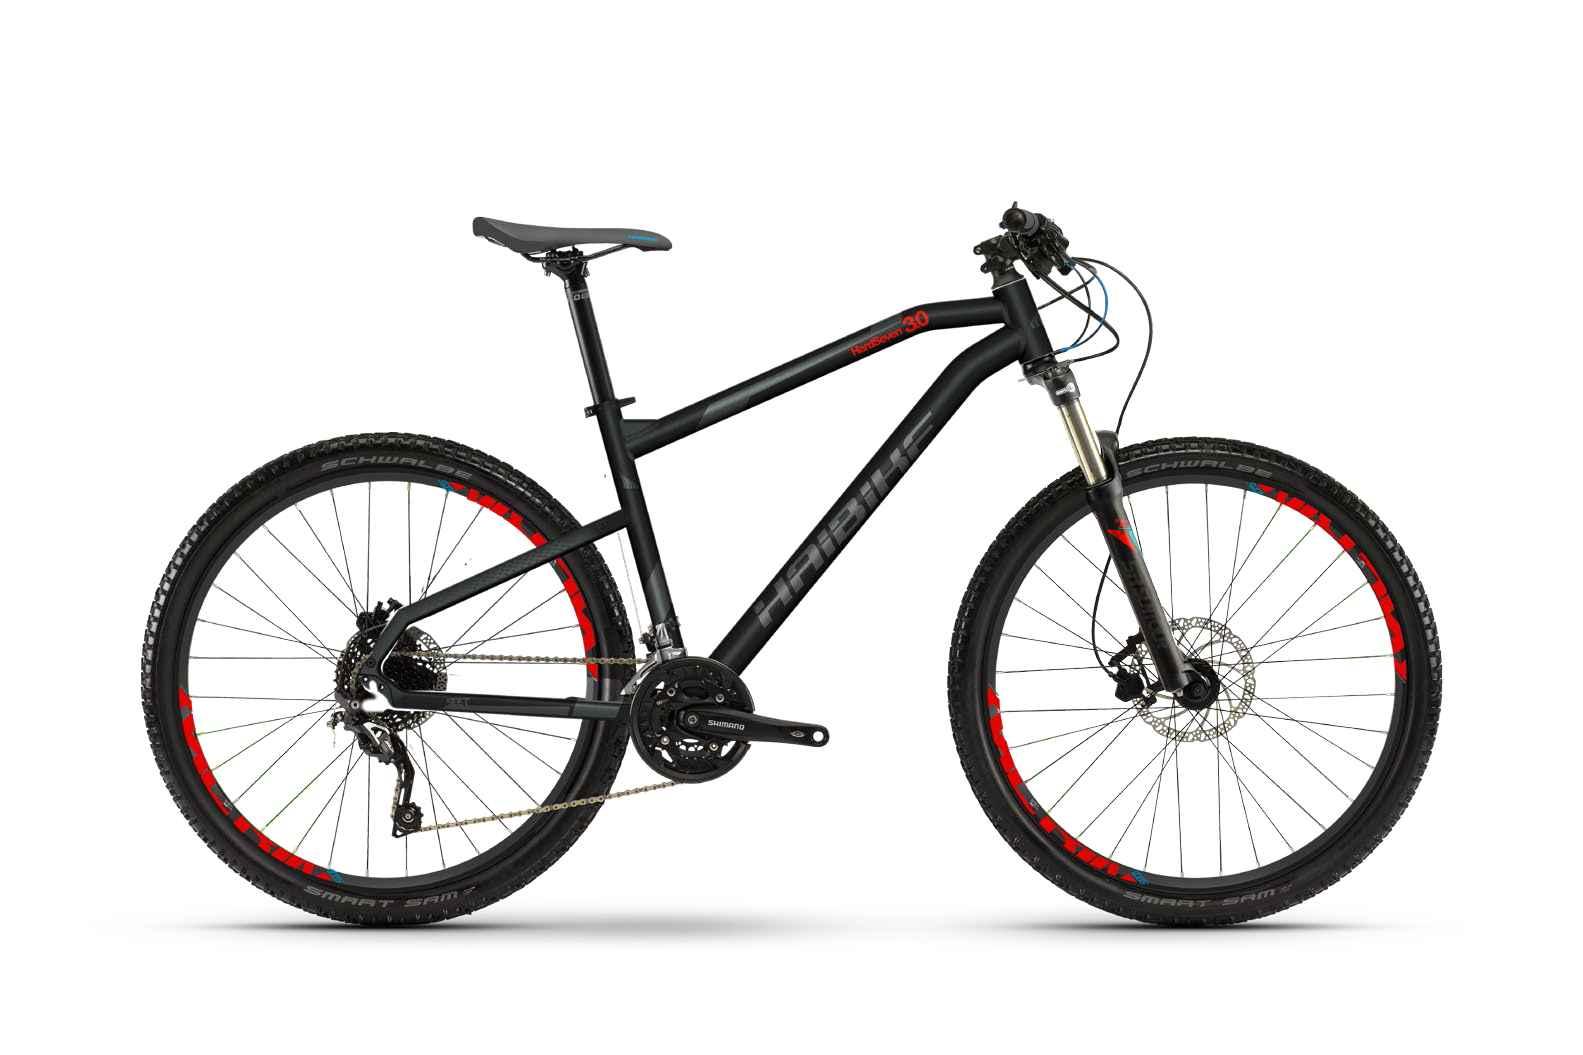 Produktbild Mountain Bike Seet Hardnine 3.0